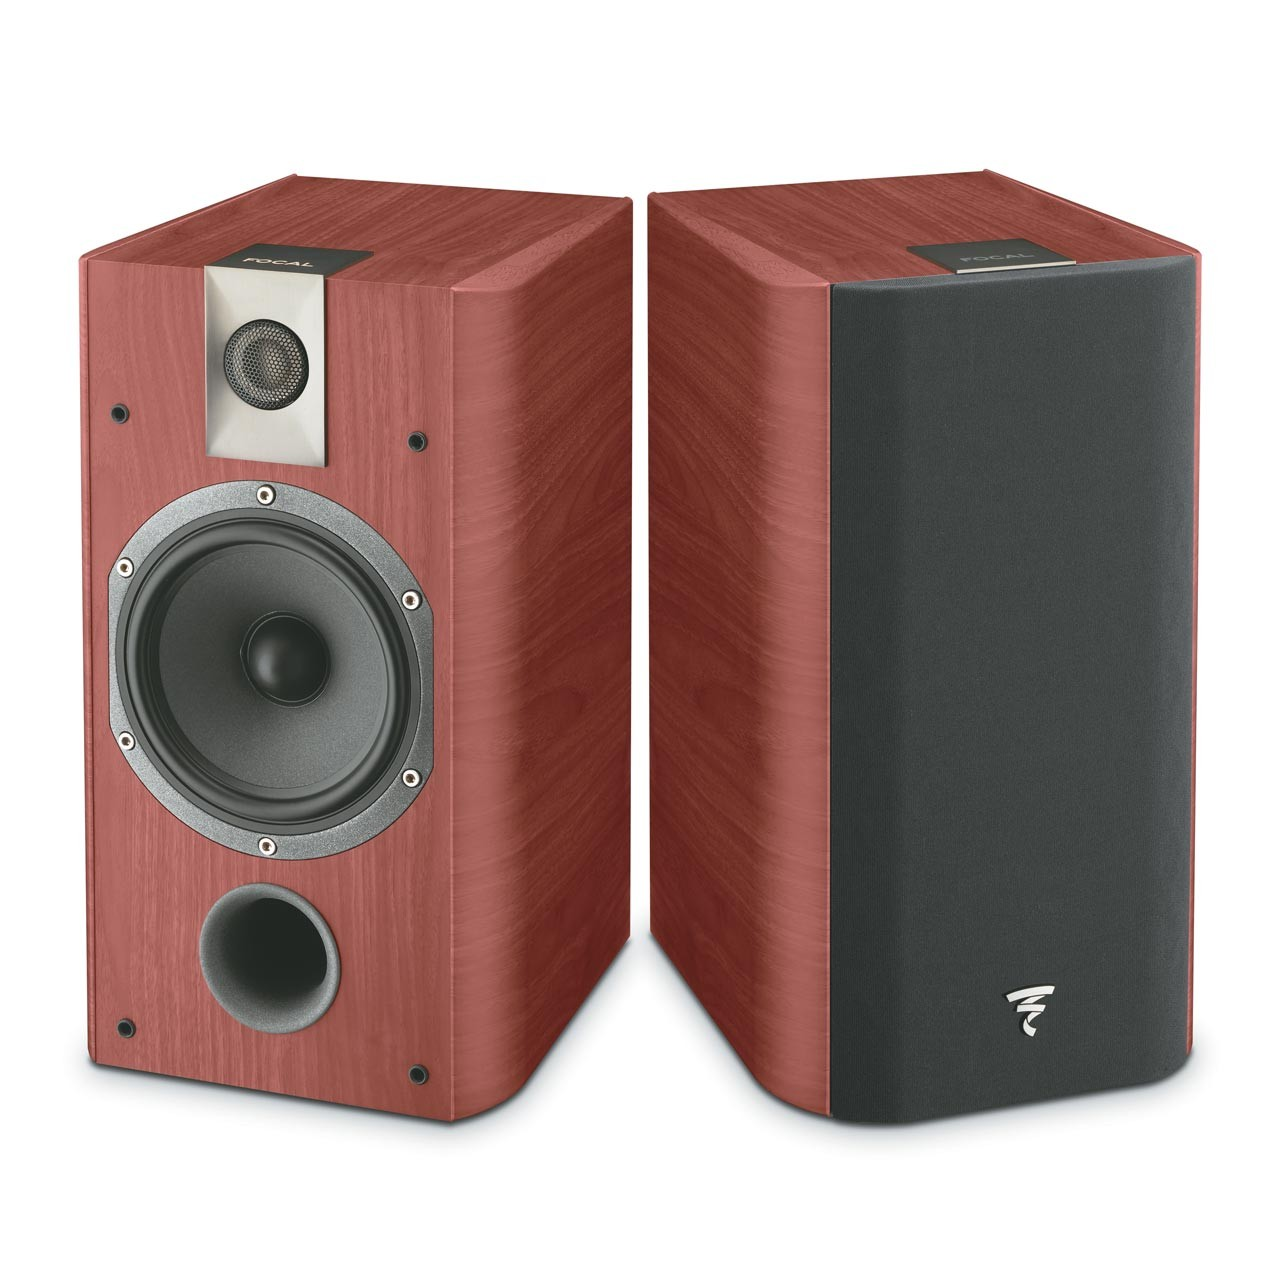 Ash Forest Hi-Fi Store in Kingston, Ontario - Speakers